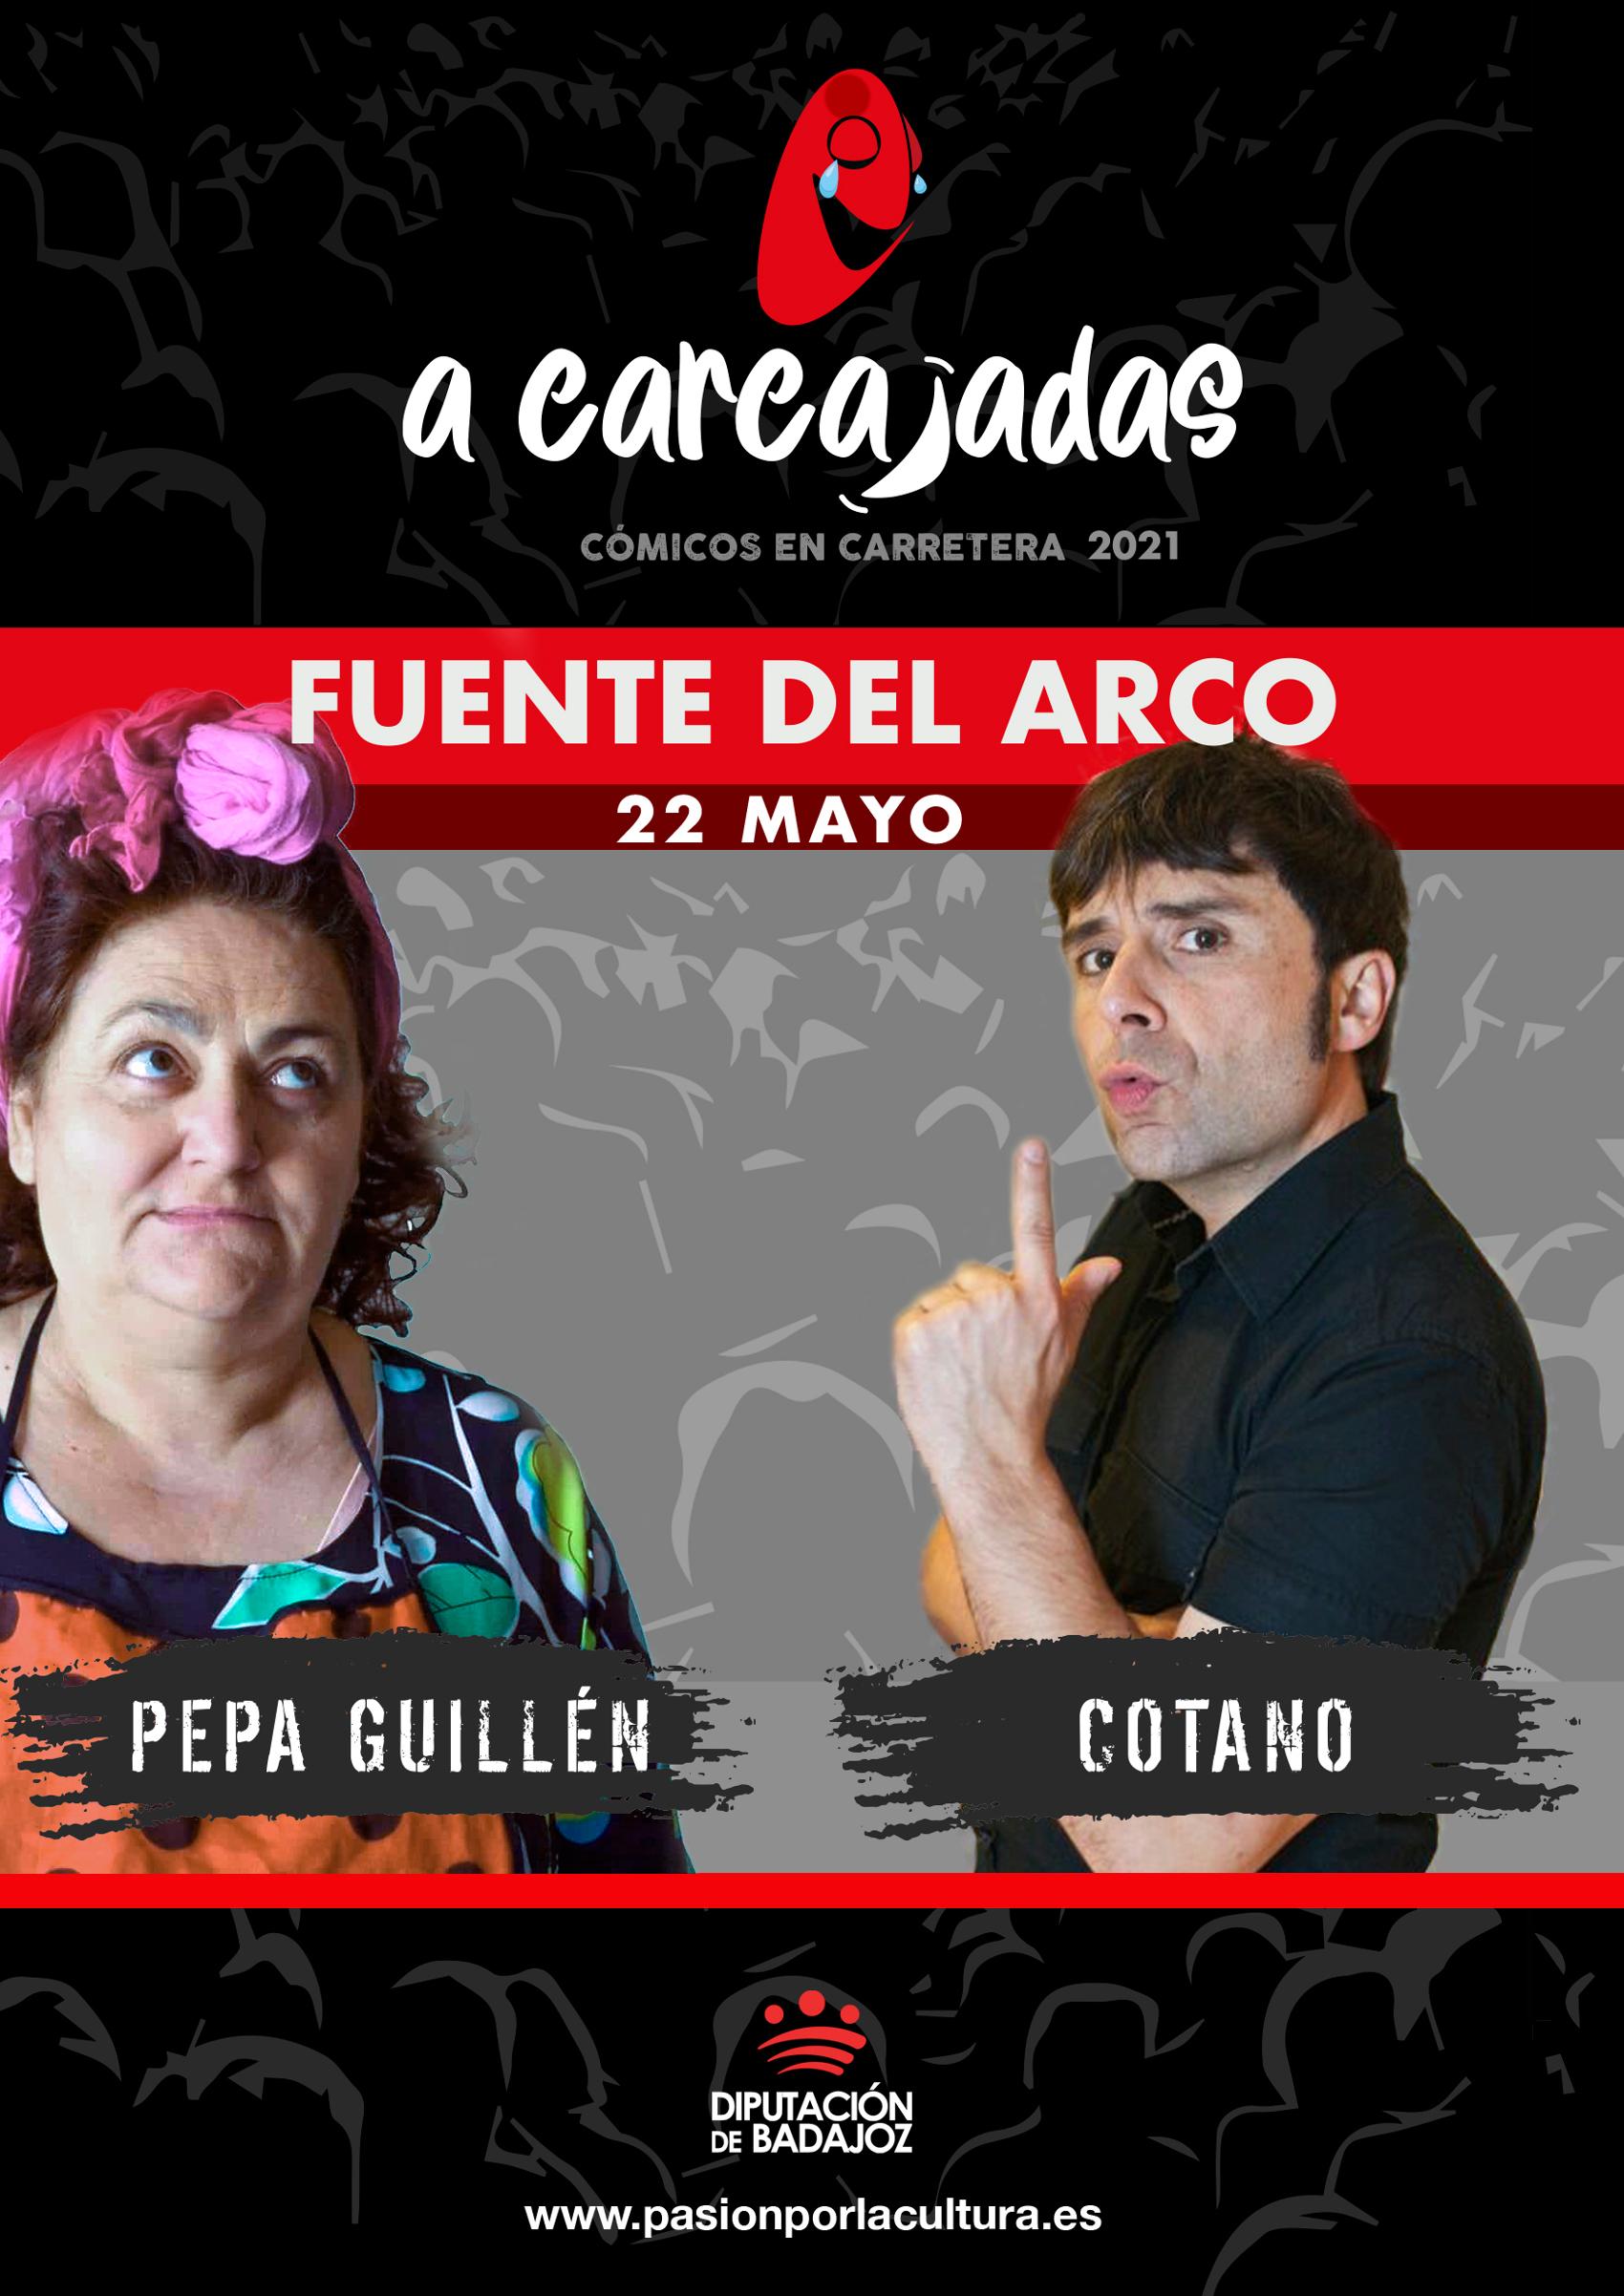 Imagen del Evento Pepa Guillén & Cotano